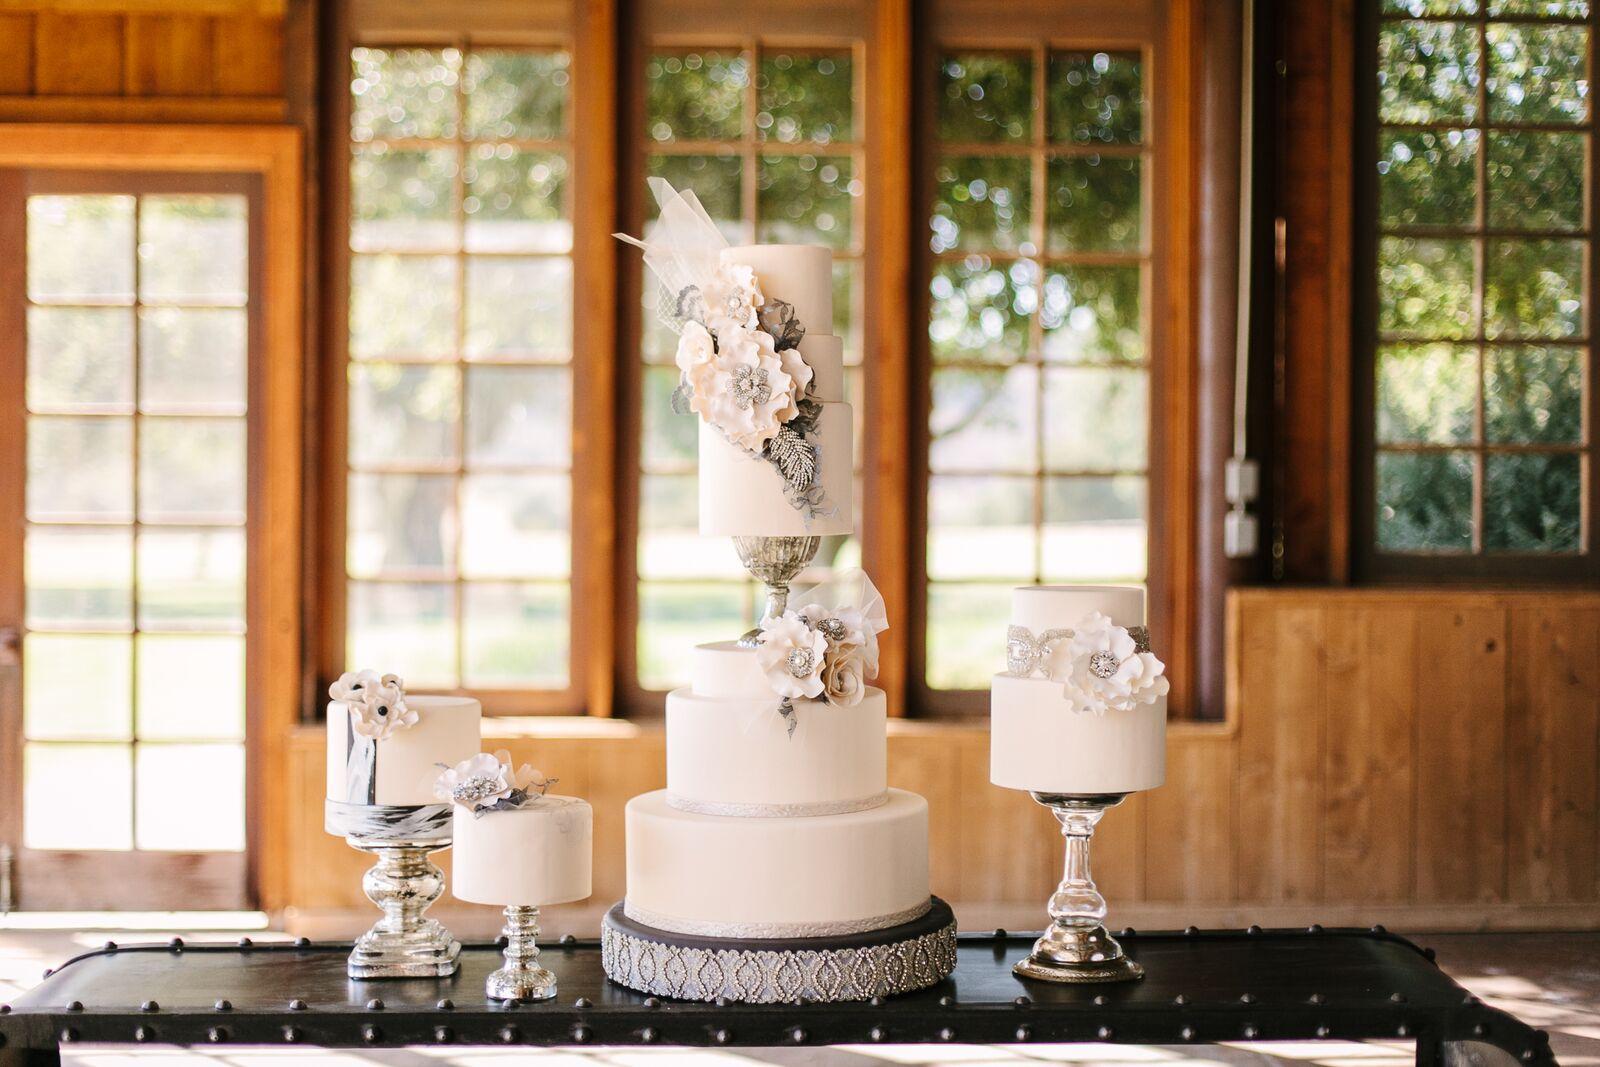 www.santabarbarawedding.com | Santa Barbara Wedding Style |  Fondant Sleek Four tier wedding cake | Brian Leahy Photography | Rani Hoover Weddings Planning